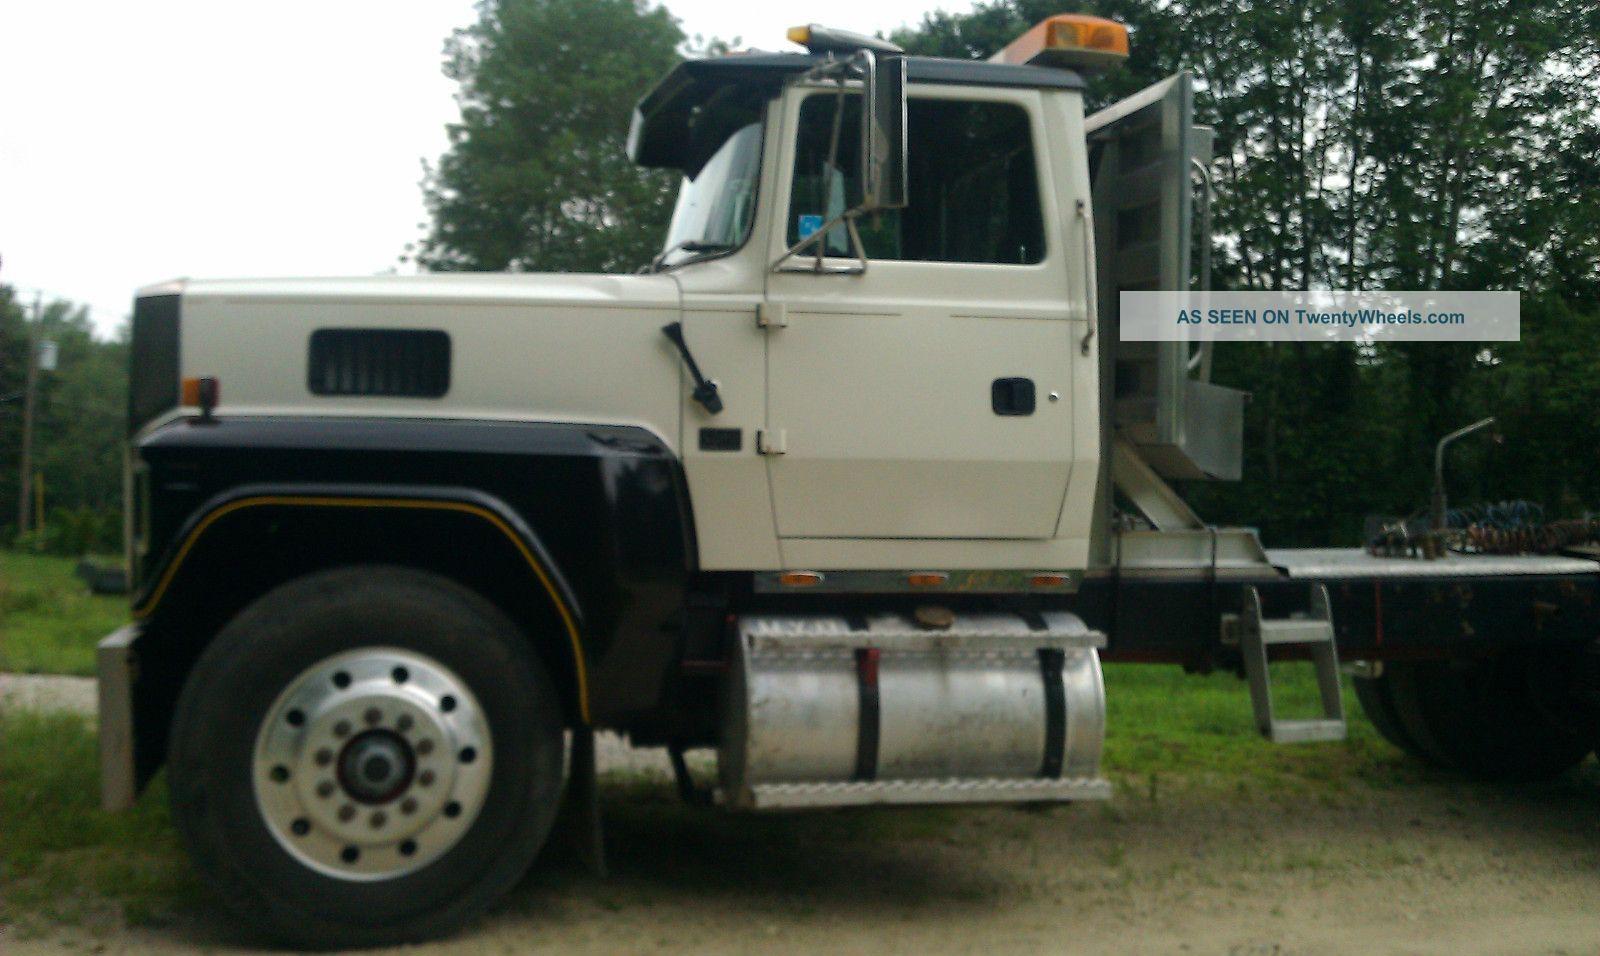 1985_ford_ltl_9000_12_lgw ford ltl 9000 trucks on wiring diagram ford ltl 9000